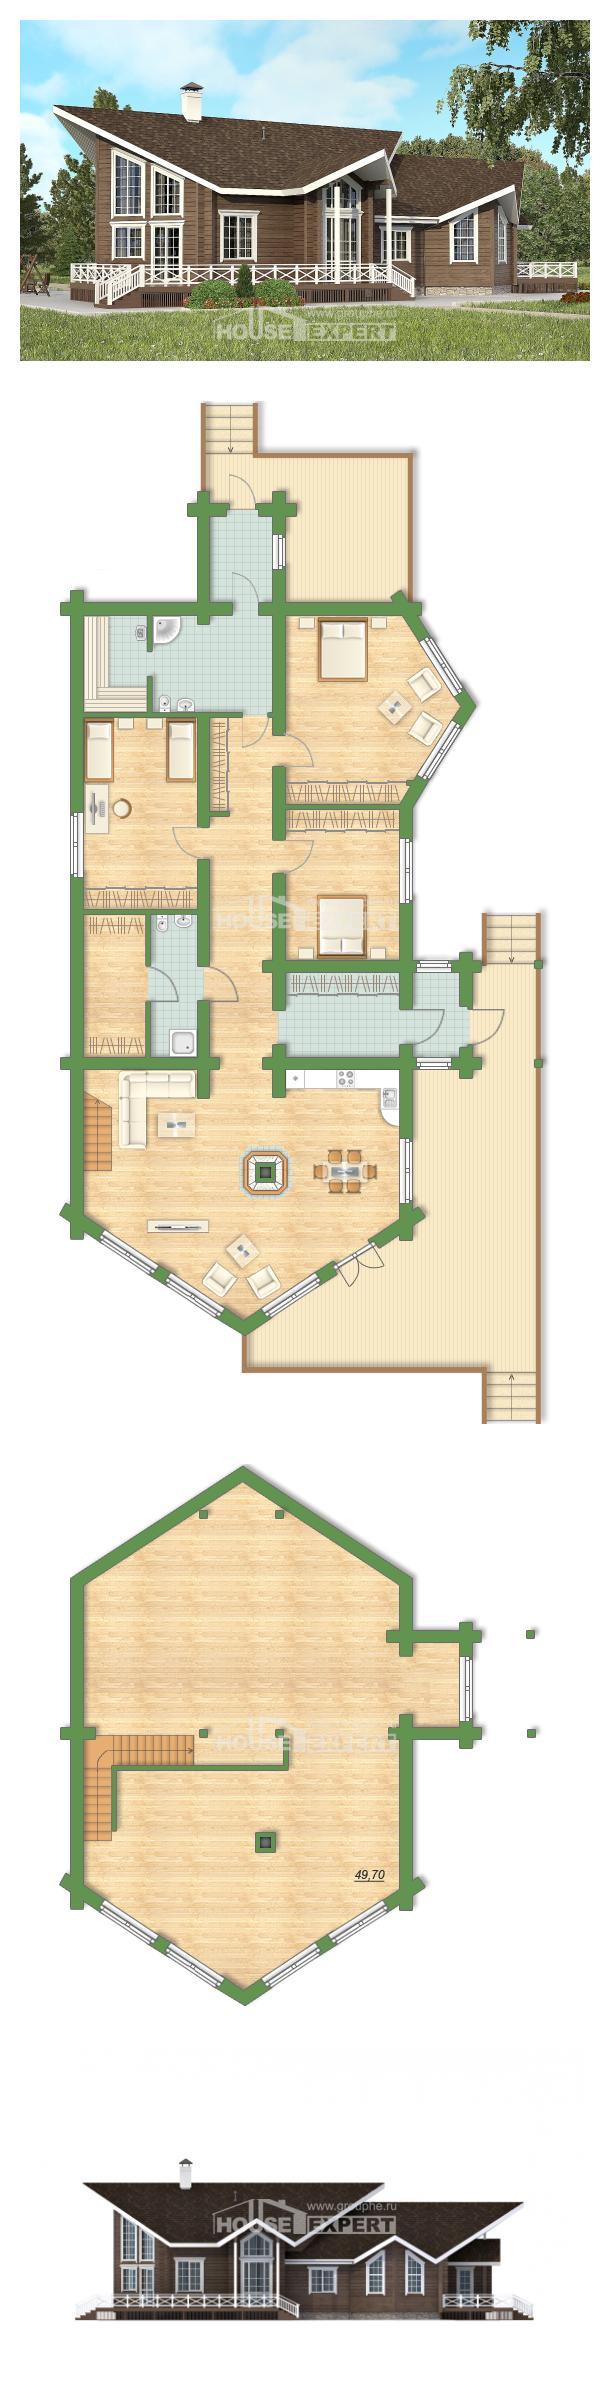 Projekt domu 210-002-L | House Expert